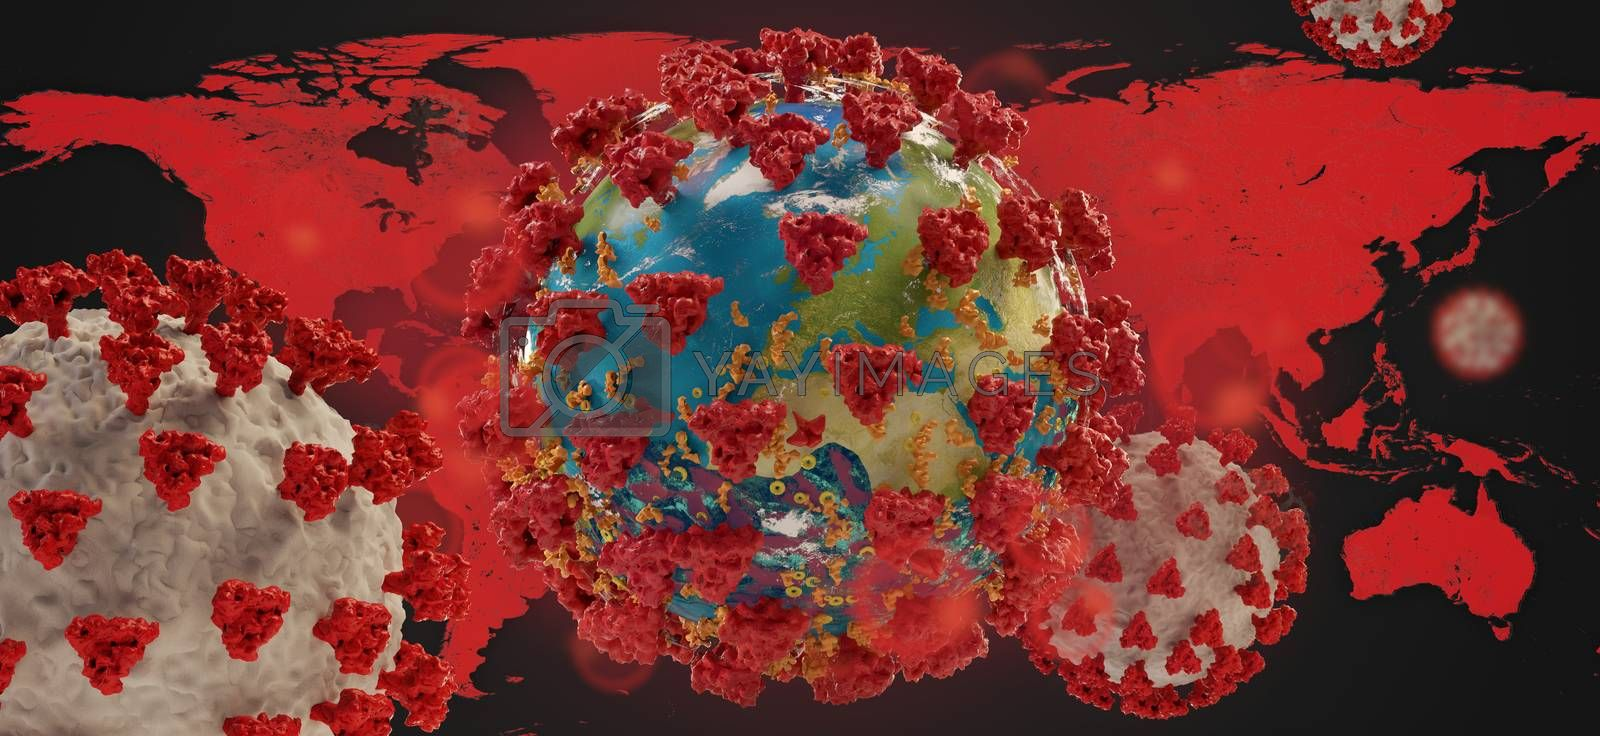 Coronavirus COVID-19 world map and globe background. elements of this image furnished by NASA